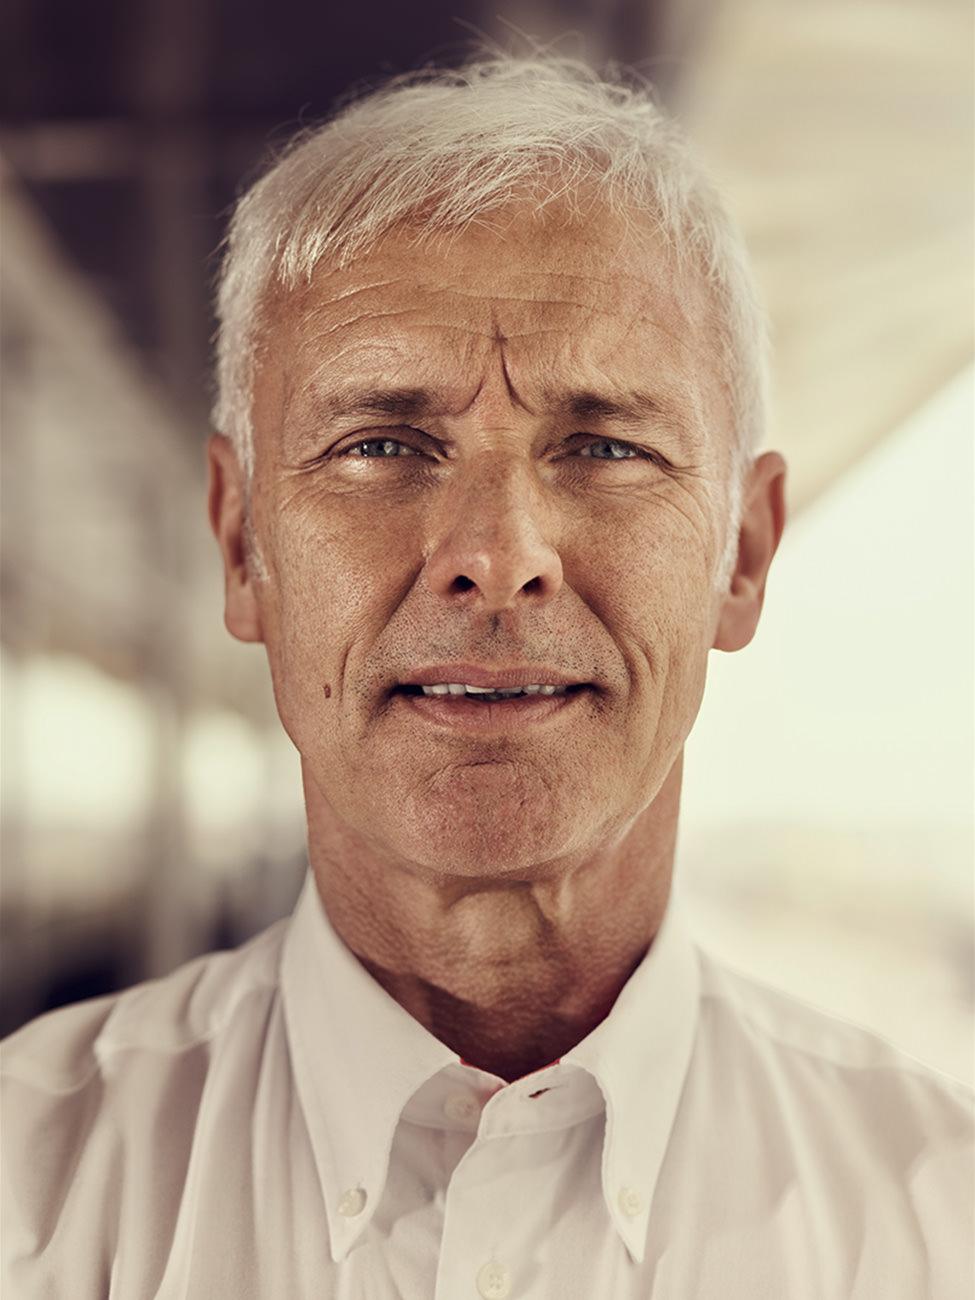 ©ankeluckmann1453v, Bahrain; Circuit; GQ; Pit lane; Porsche; Race Track; Transportation; WEC; 6 hours Bahrain; Portrait; Matthias Mueller; CEO, anke luckmann, www.ankeluckmann.com, kai tietz, racing